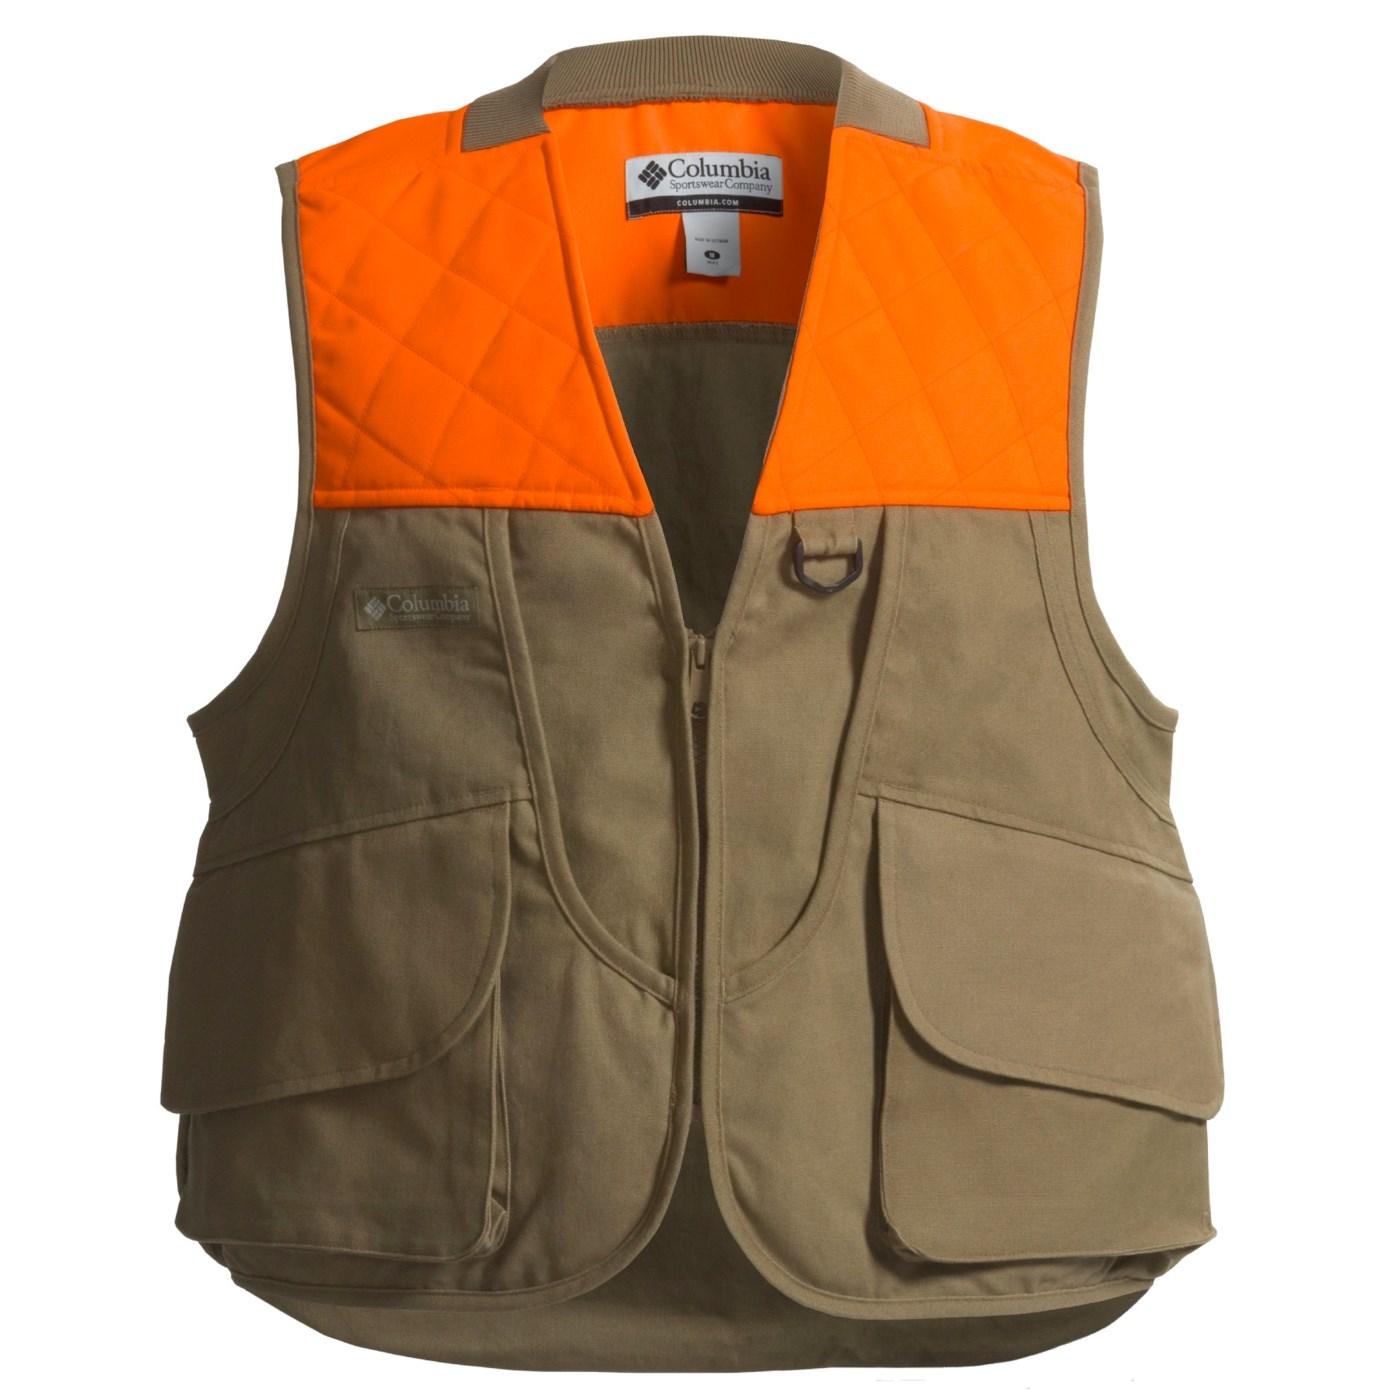 c590f0b2df483 Columbia Sportswear Cockbird Upland Hunting Vest (For Big Men) 1639U ...